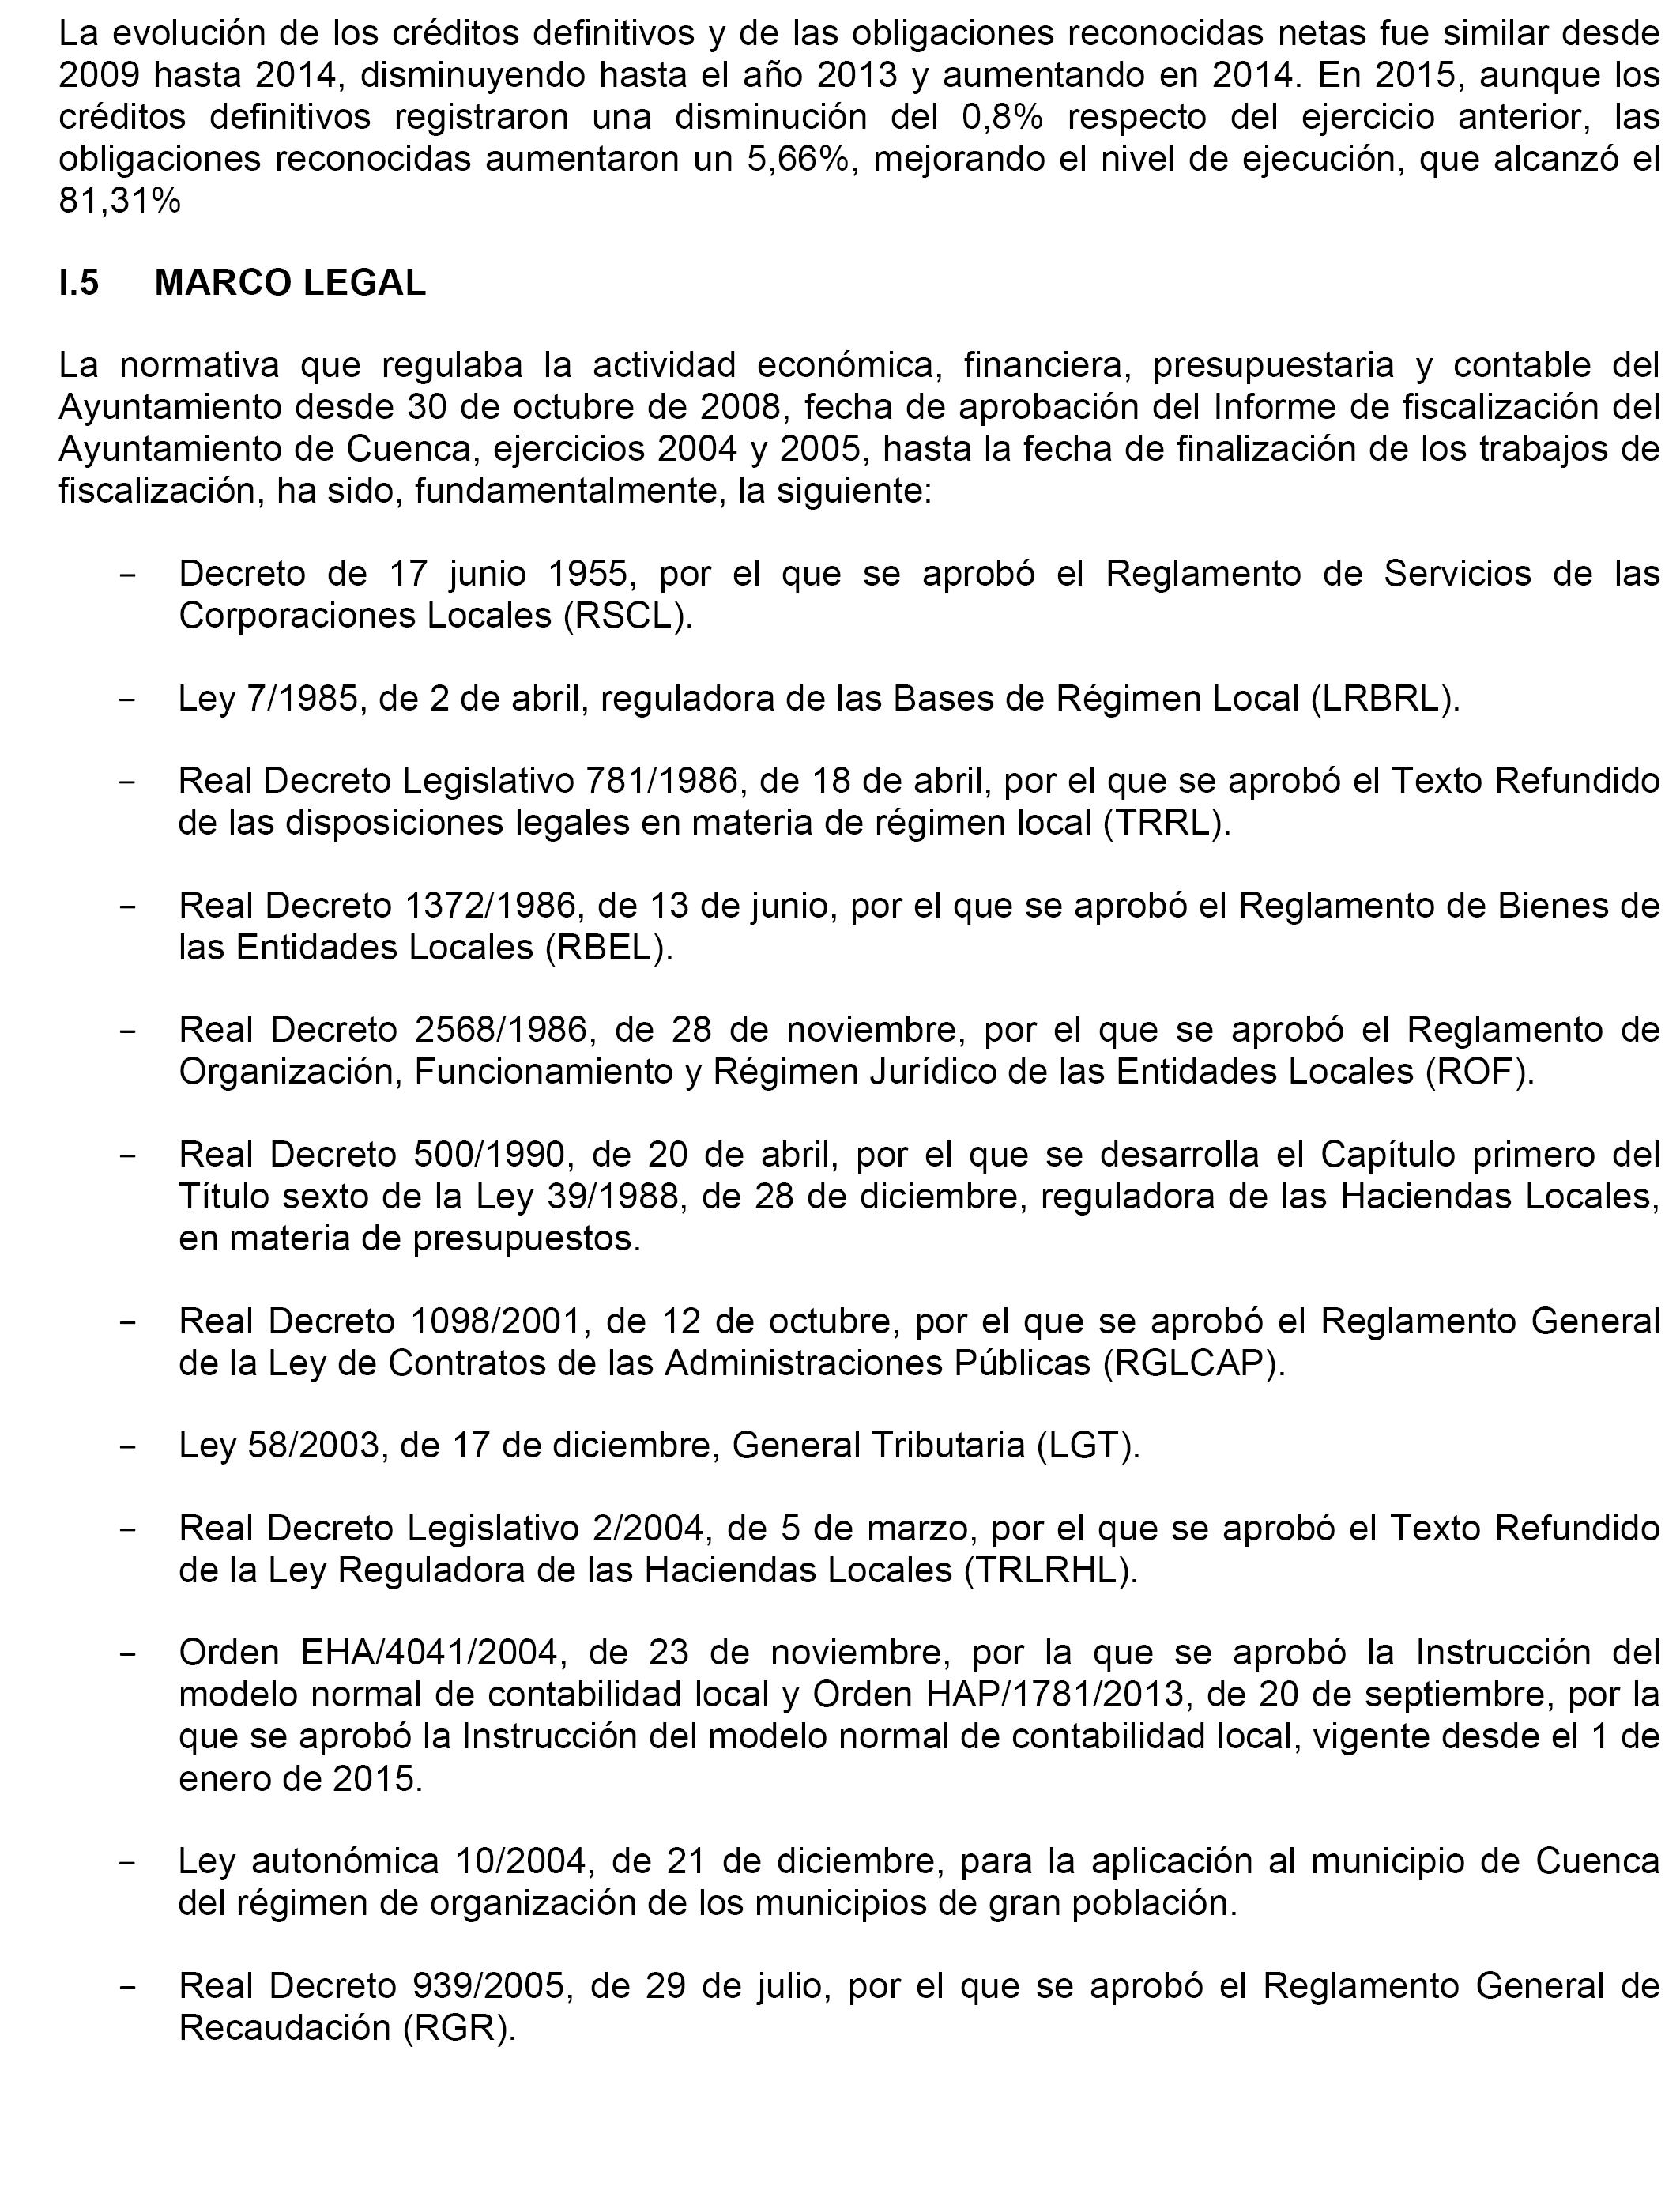 BOE.es - Documento BOE-A-2018-2663